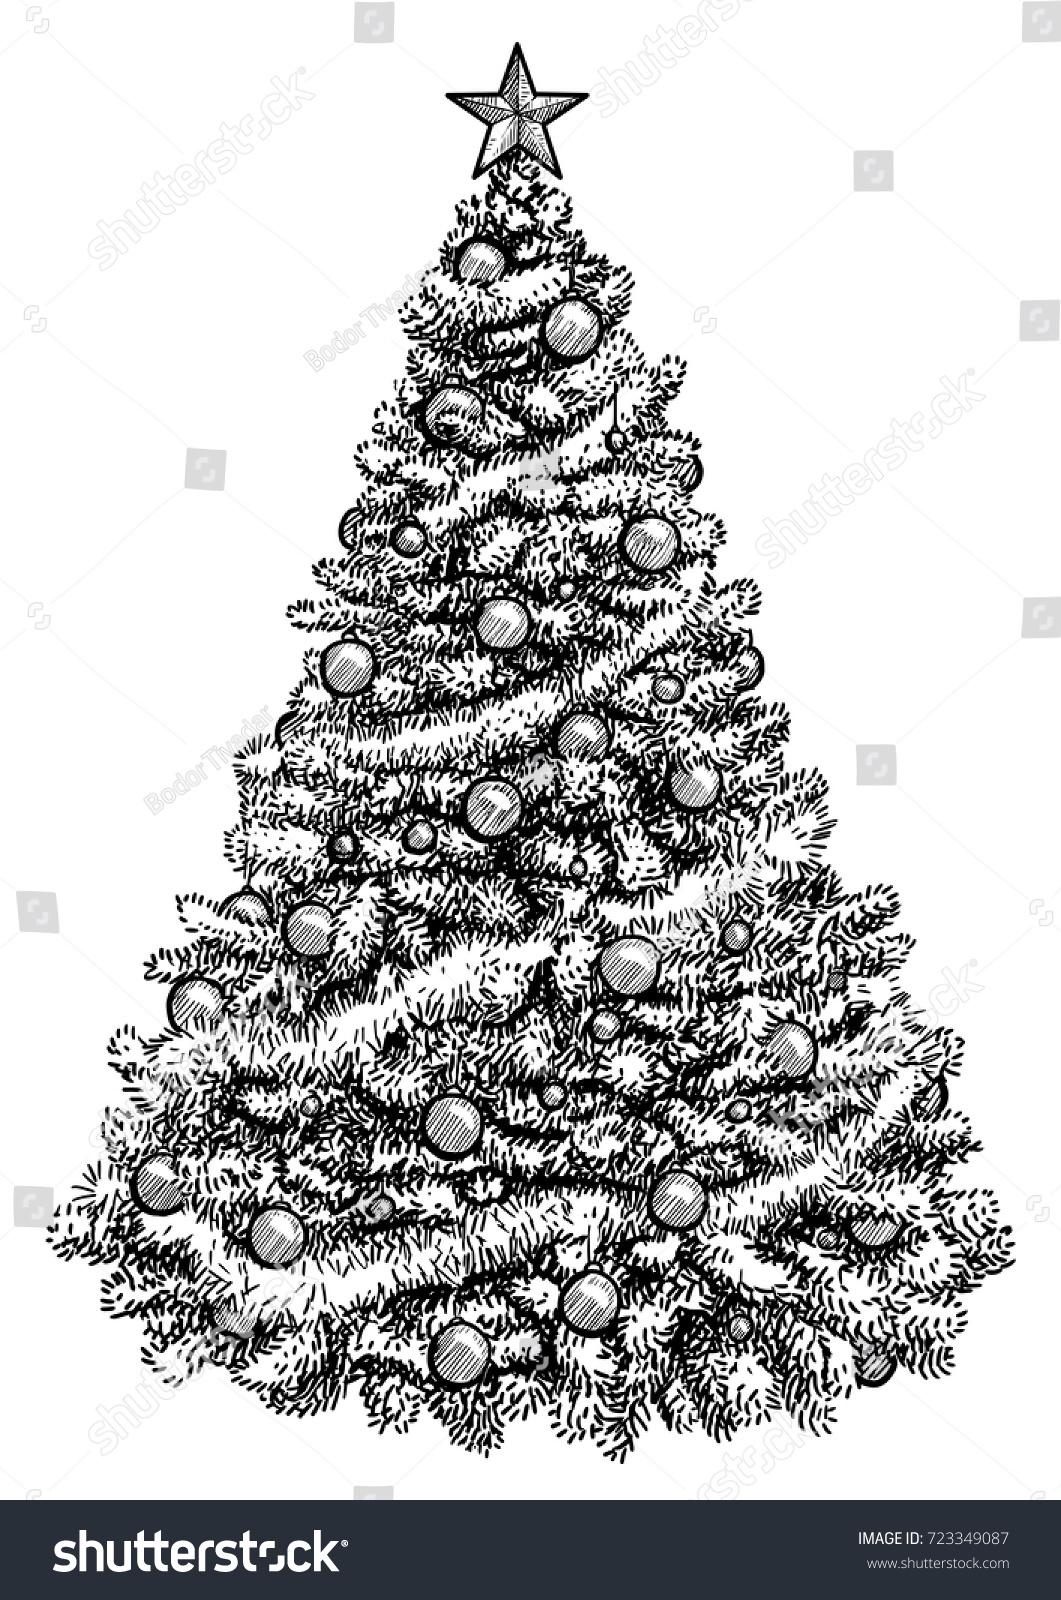 Line Drawing Christmas Tree : Christmas tree illustration drawing engraving ink stock